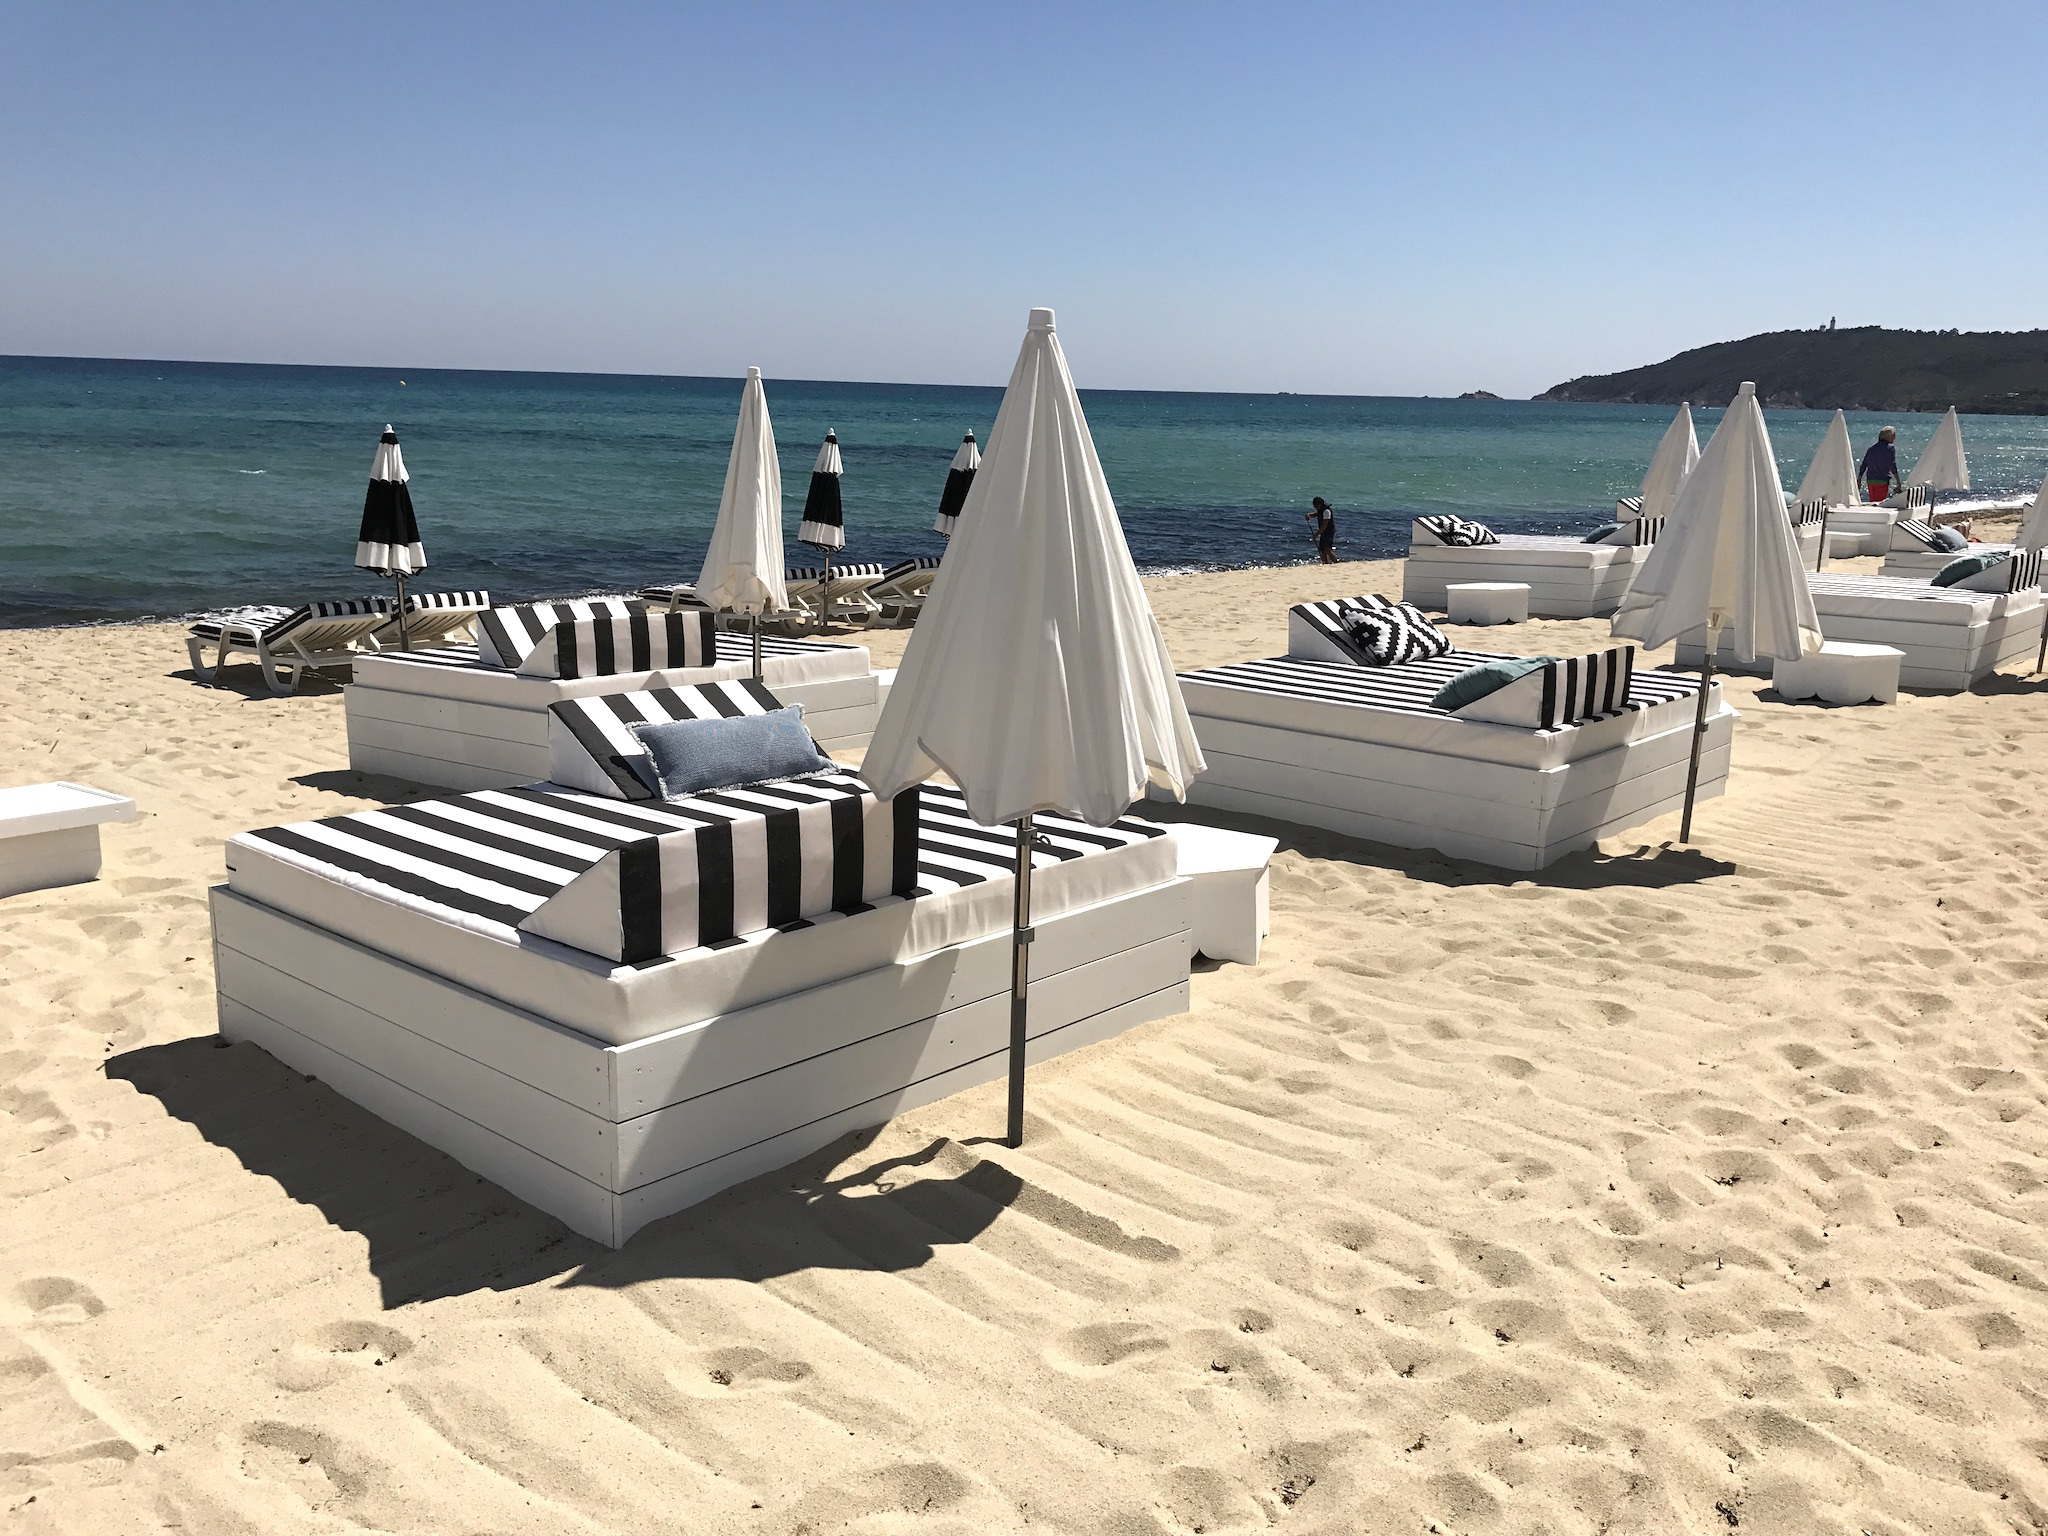 Maison Bianca Strand Club St. Tropez, Maison Bianca St. Tropez, stylisher Beachclub St. Tropez, schönster Strand Club Pampelonne, Lifestyle-Blog, Lieblingstil.com